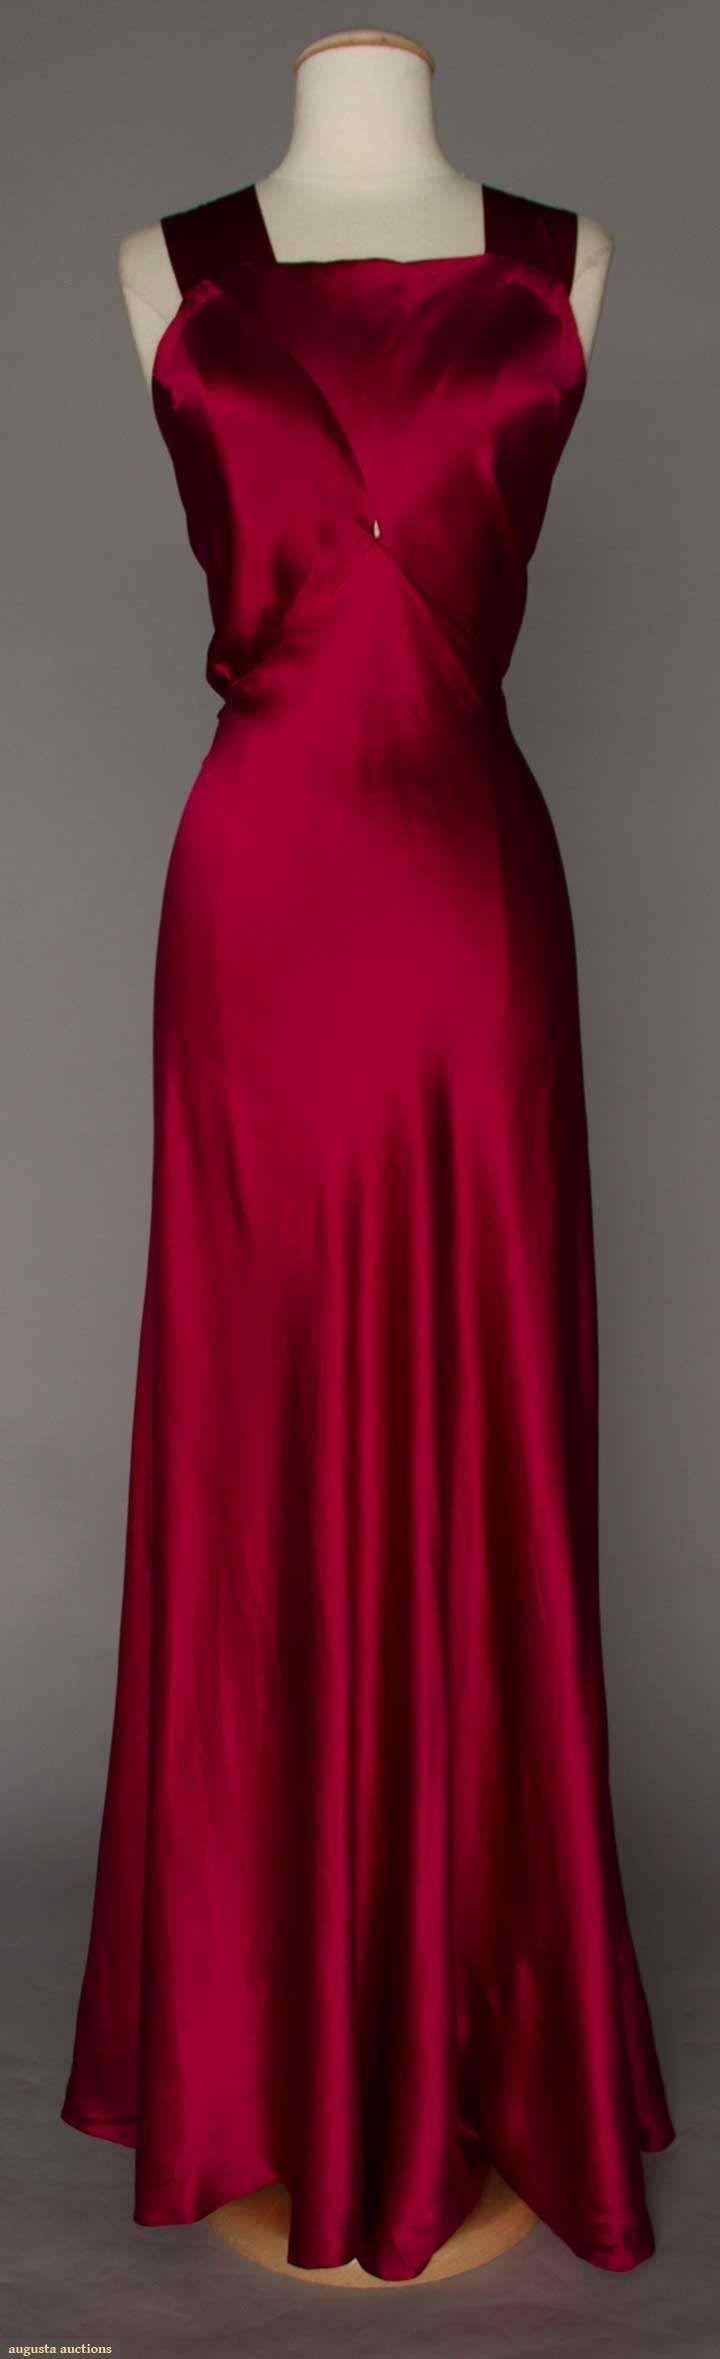 1930's Bias Cut Gown